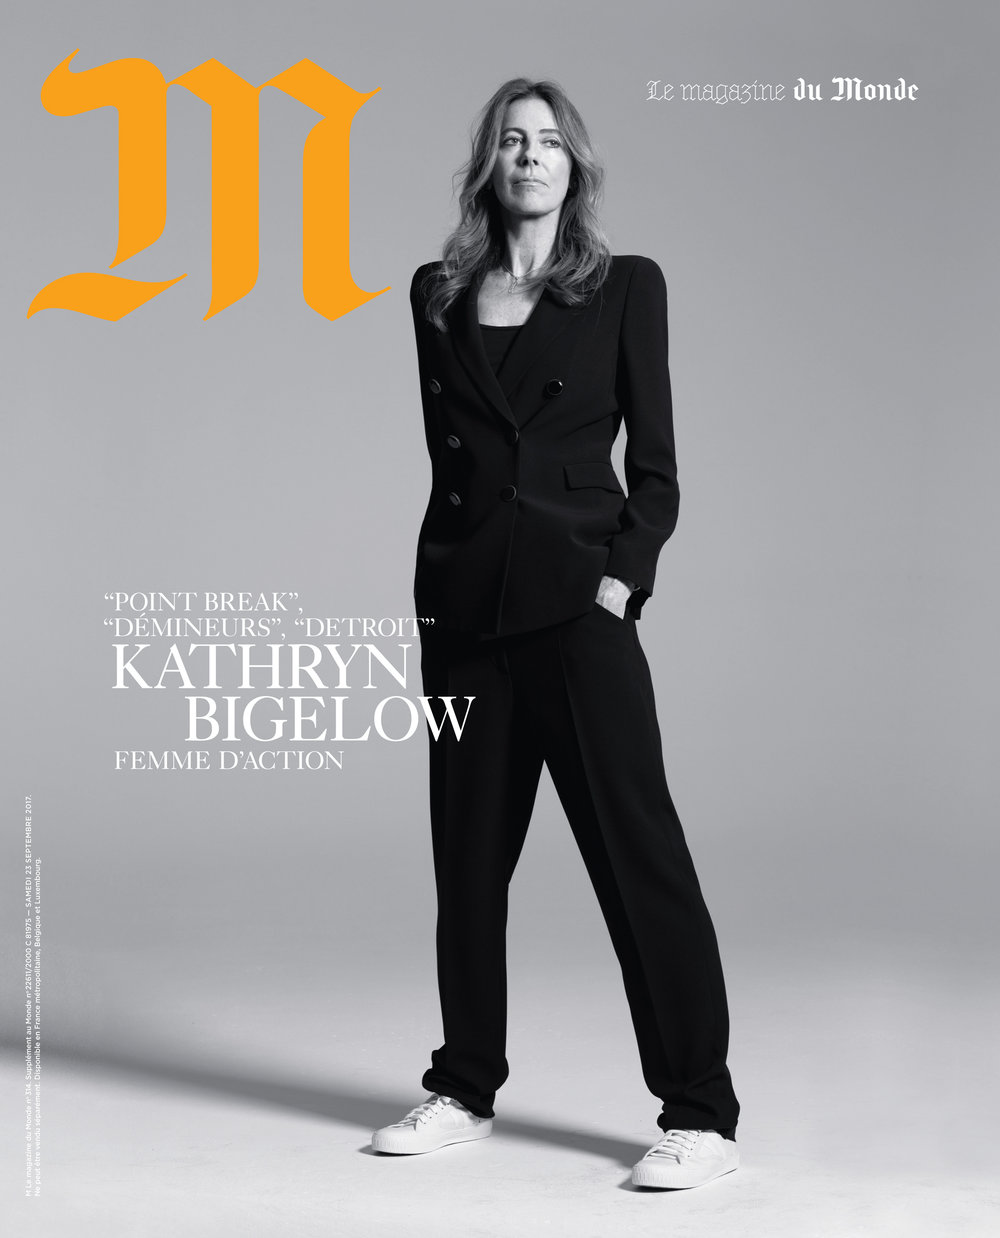 Kathryn Bigelow, New York